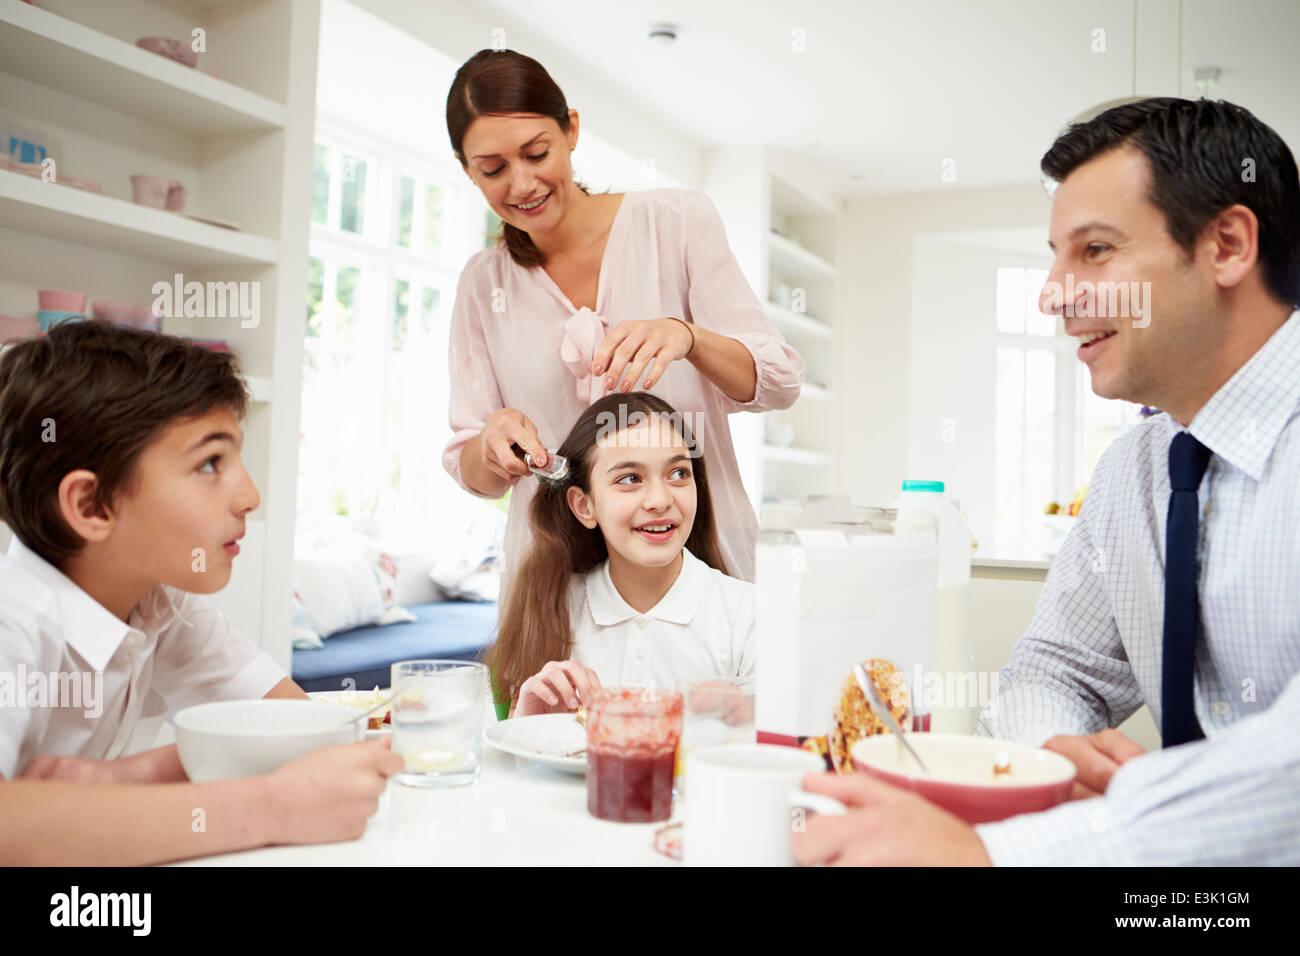 Le petit déjeuner de la famille avant de mari va travailler Photo Stock